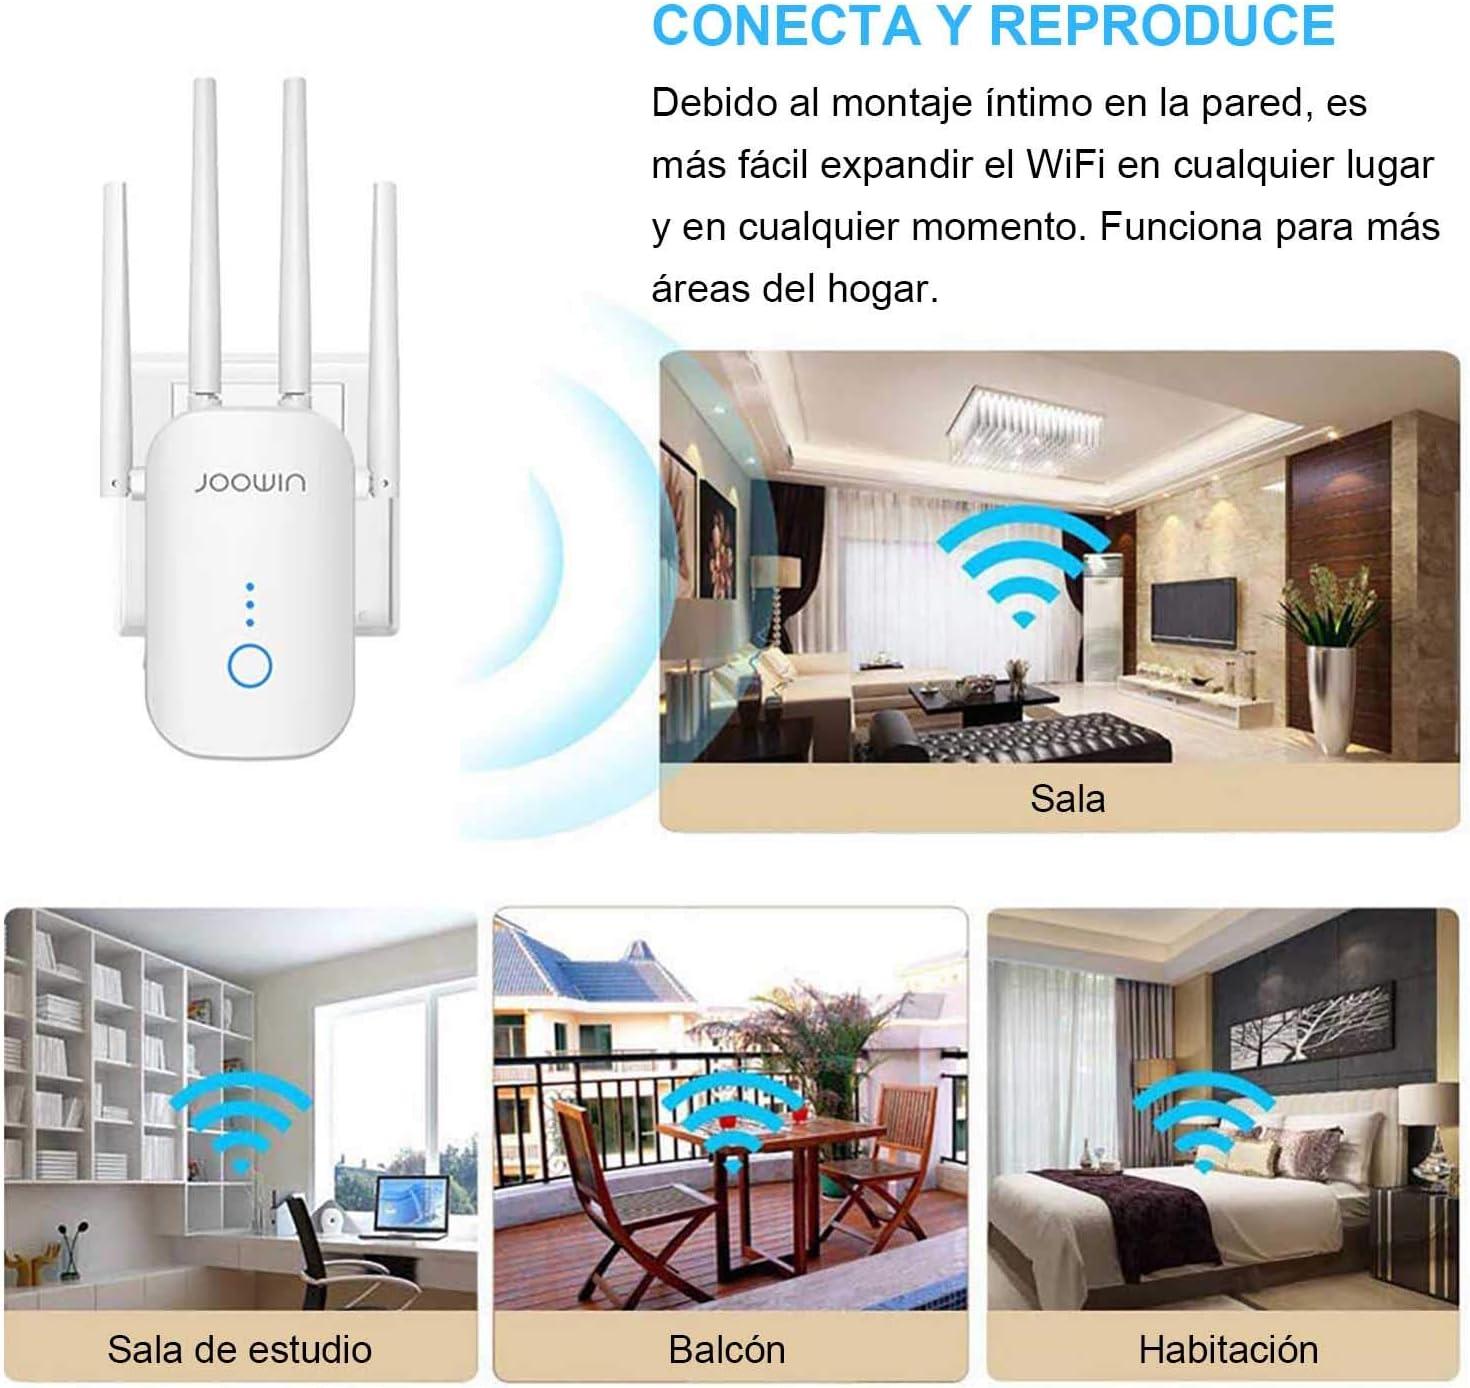 Repetidor WiFi Joowin 2.4GHz + 5GHz por 27,99€ ¡¡39% de descuento!!